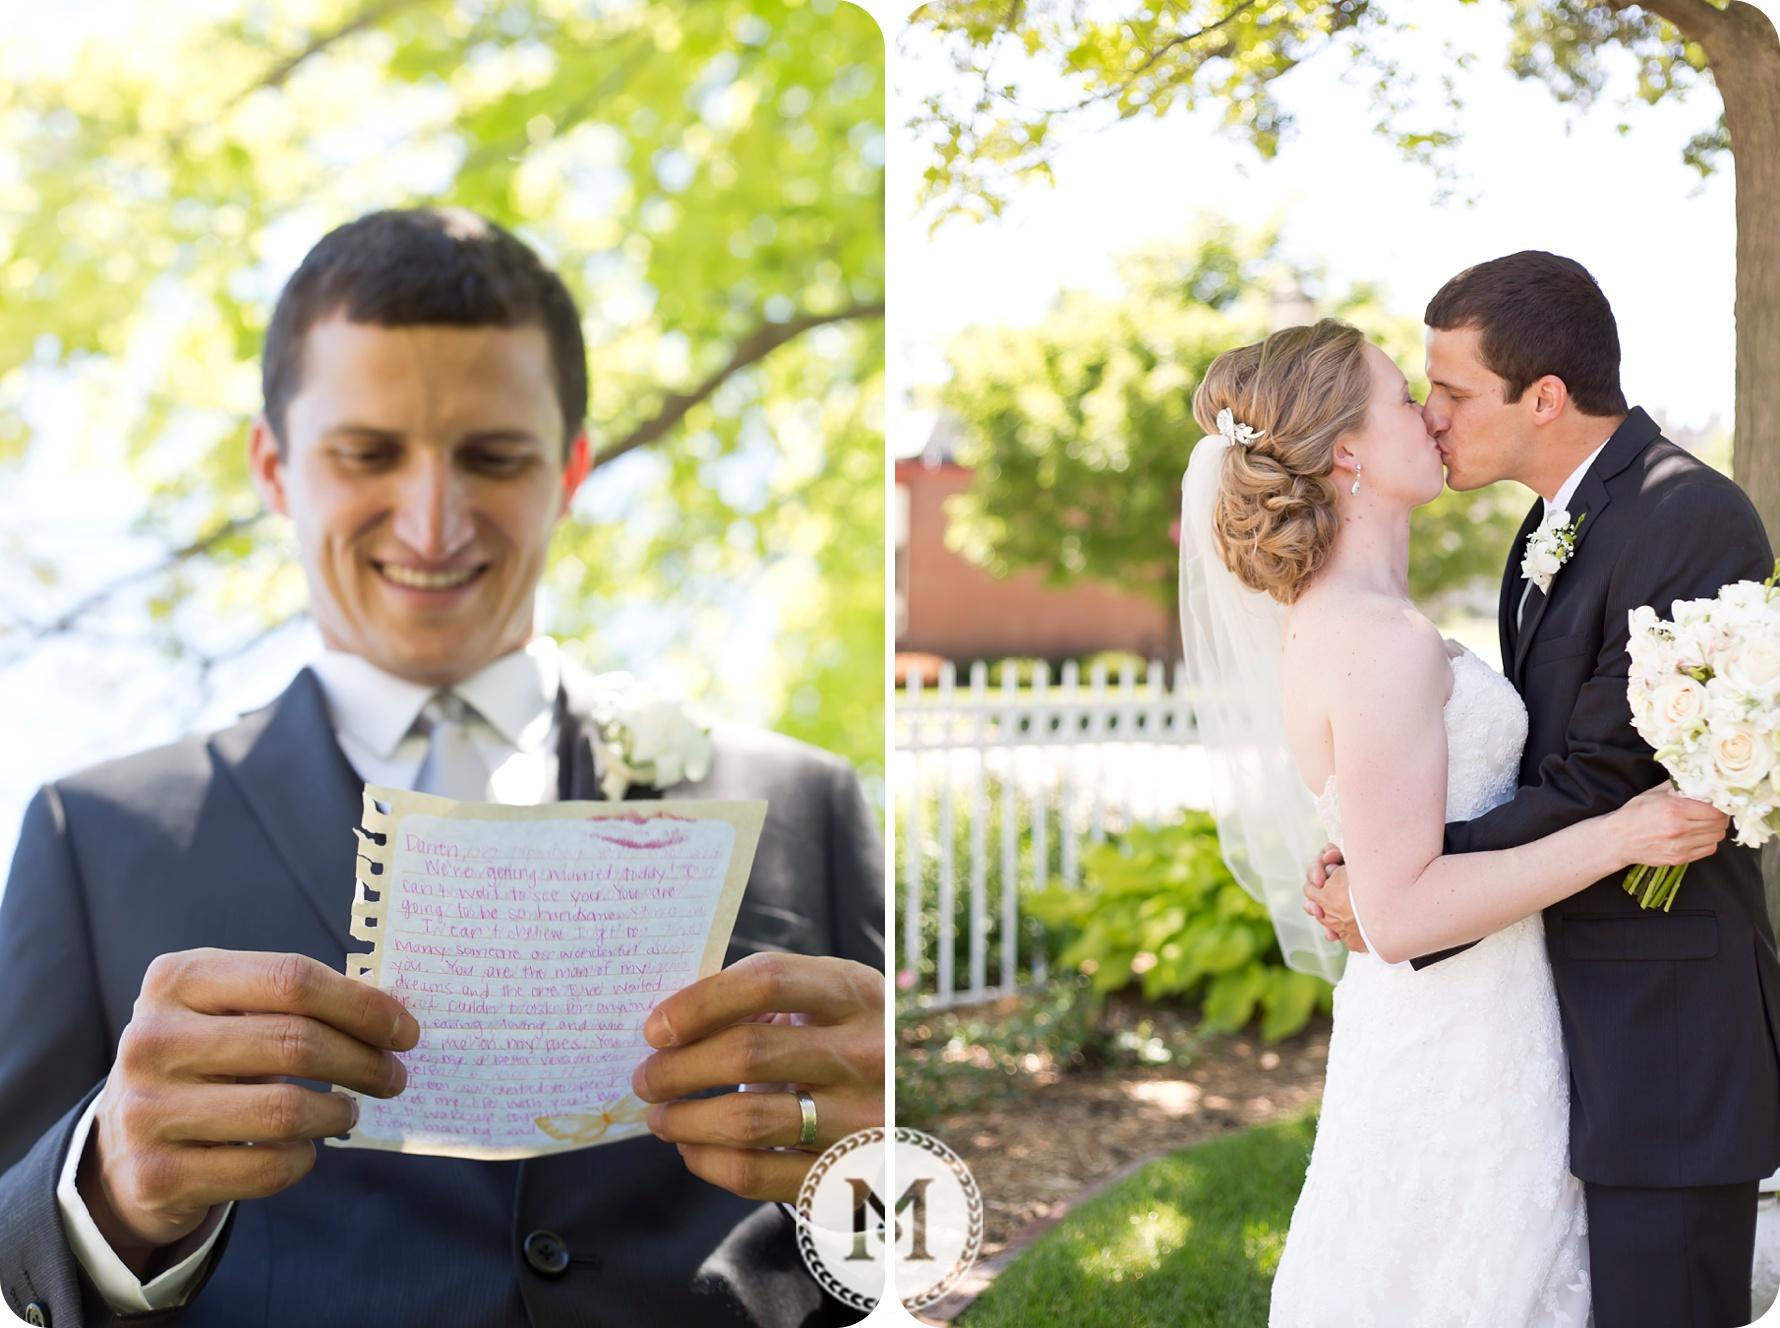 mckenziesmithphotography.com_0342